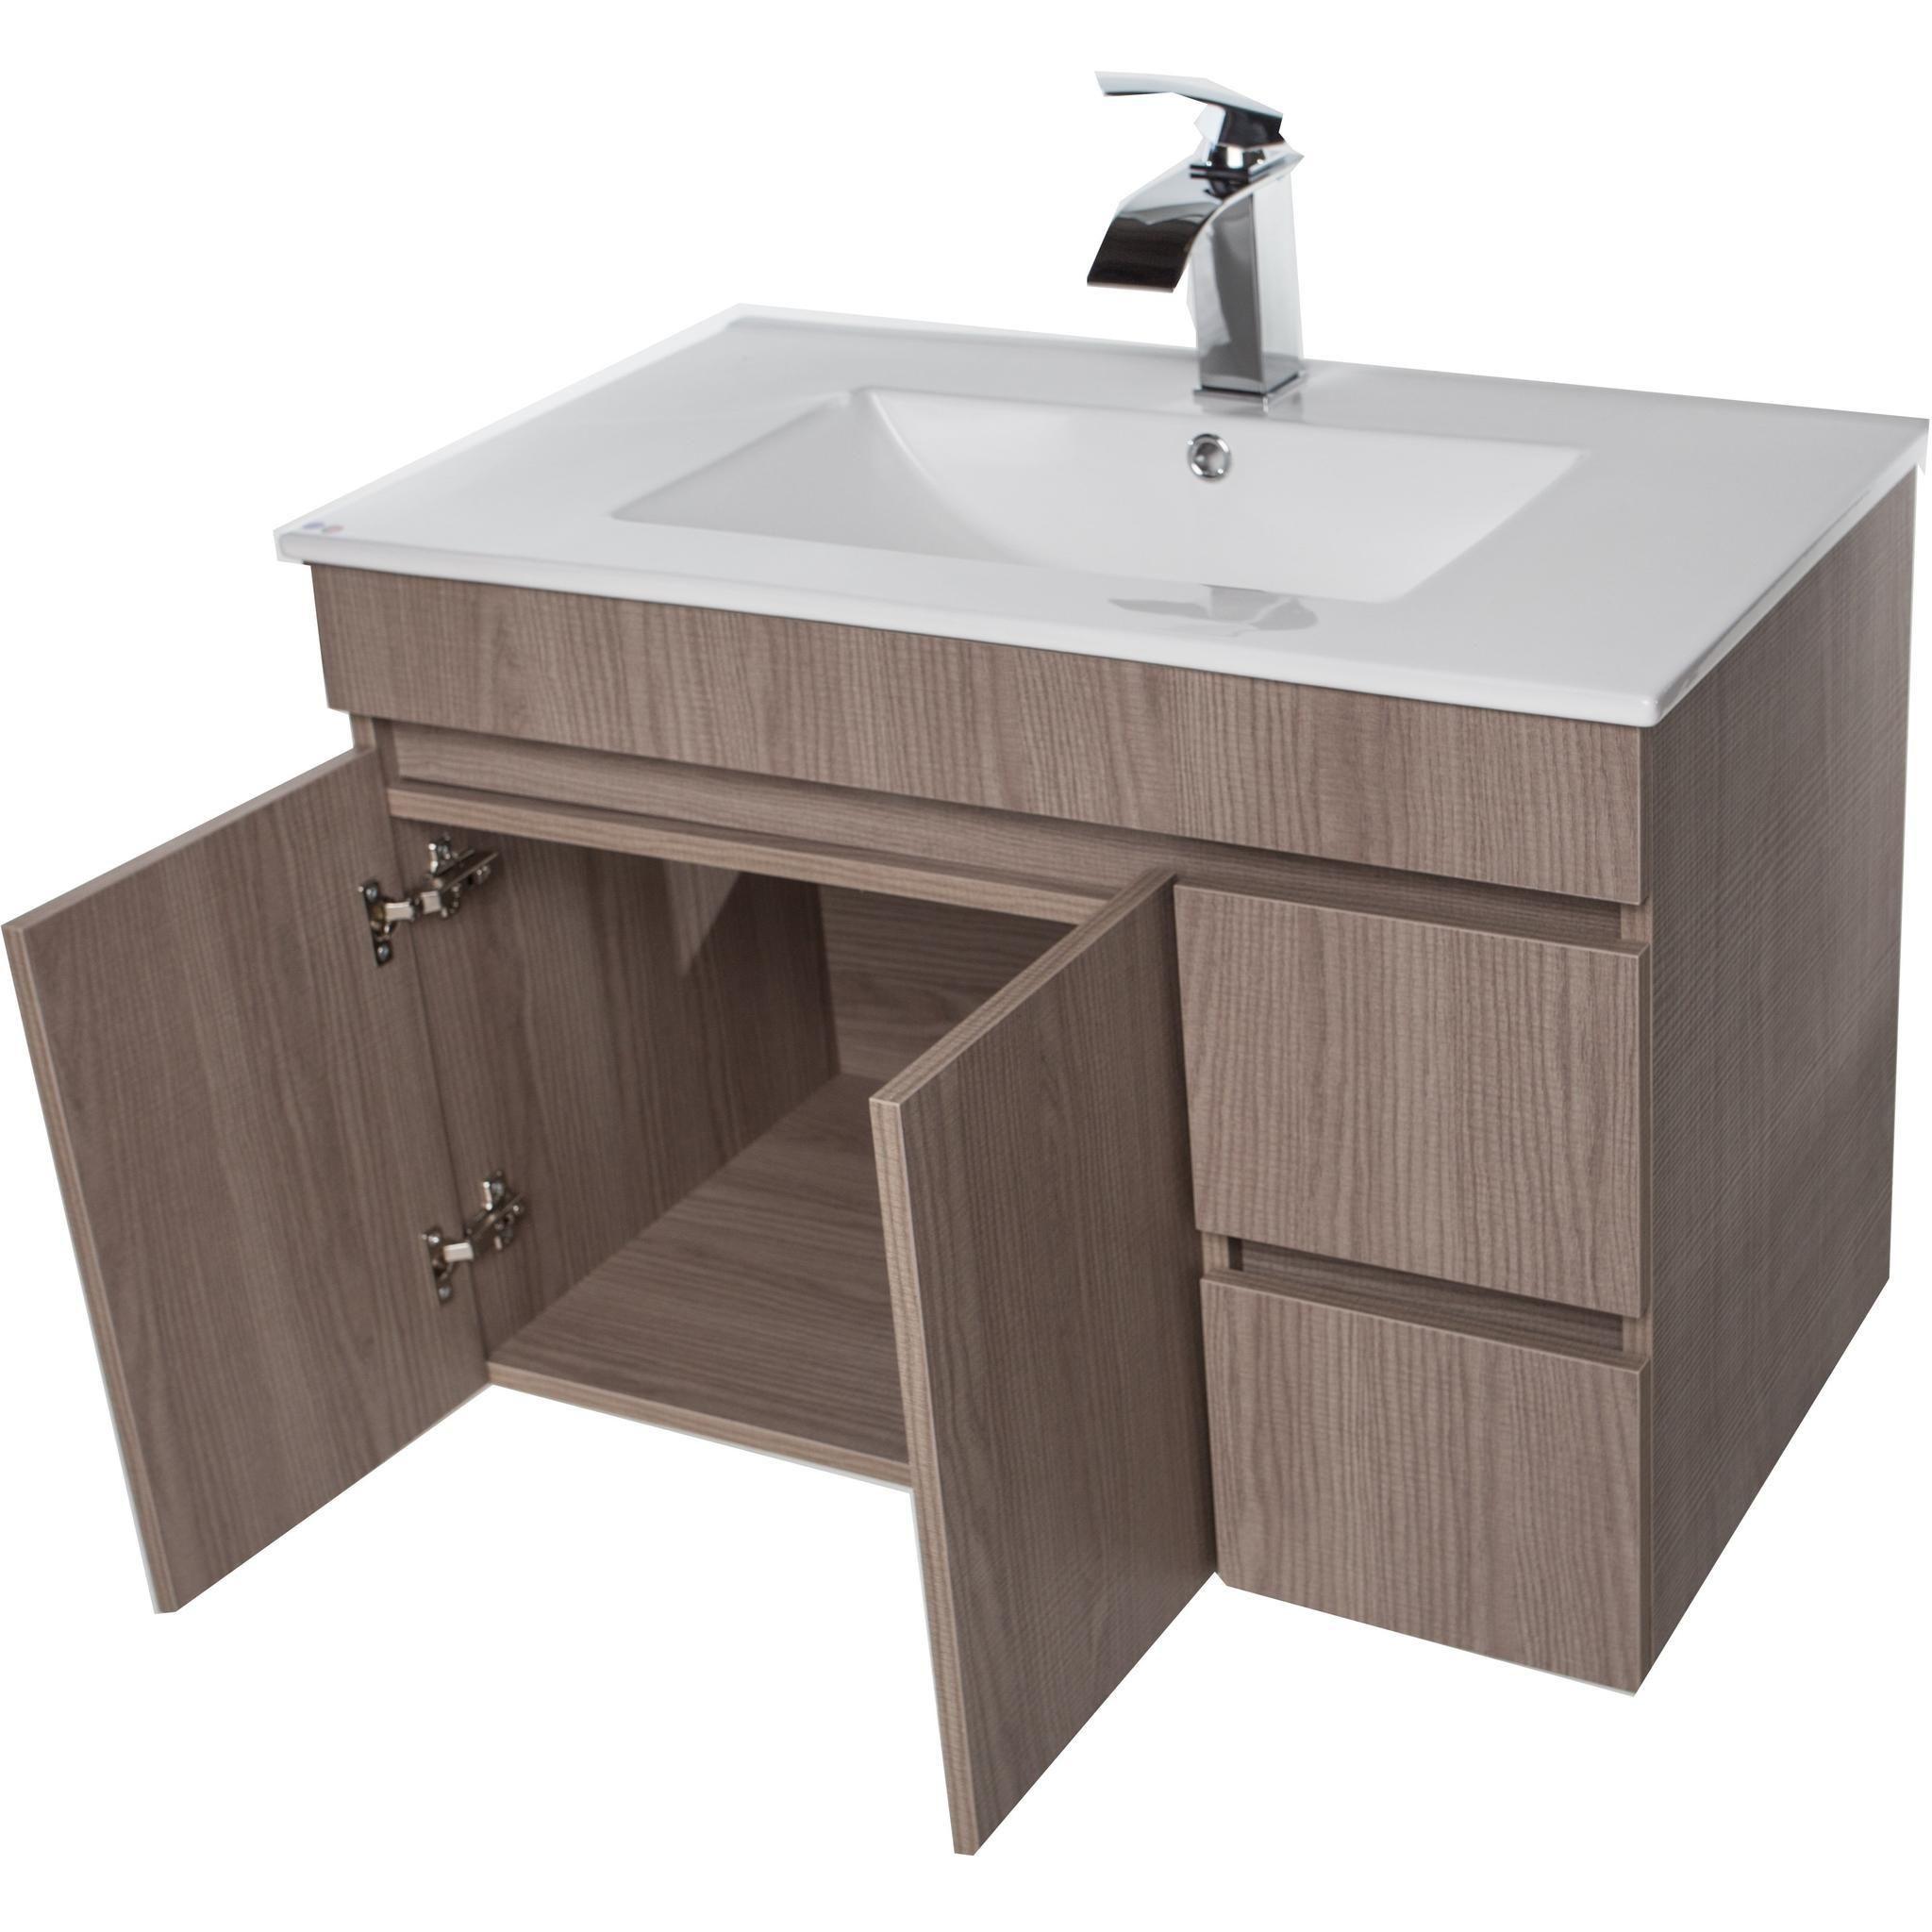 Strato 32 Bathroom Furniture Design Bathroom Cabinets Designs Bathroom Furniture Storage